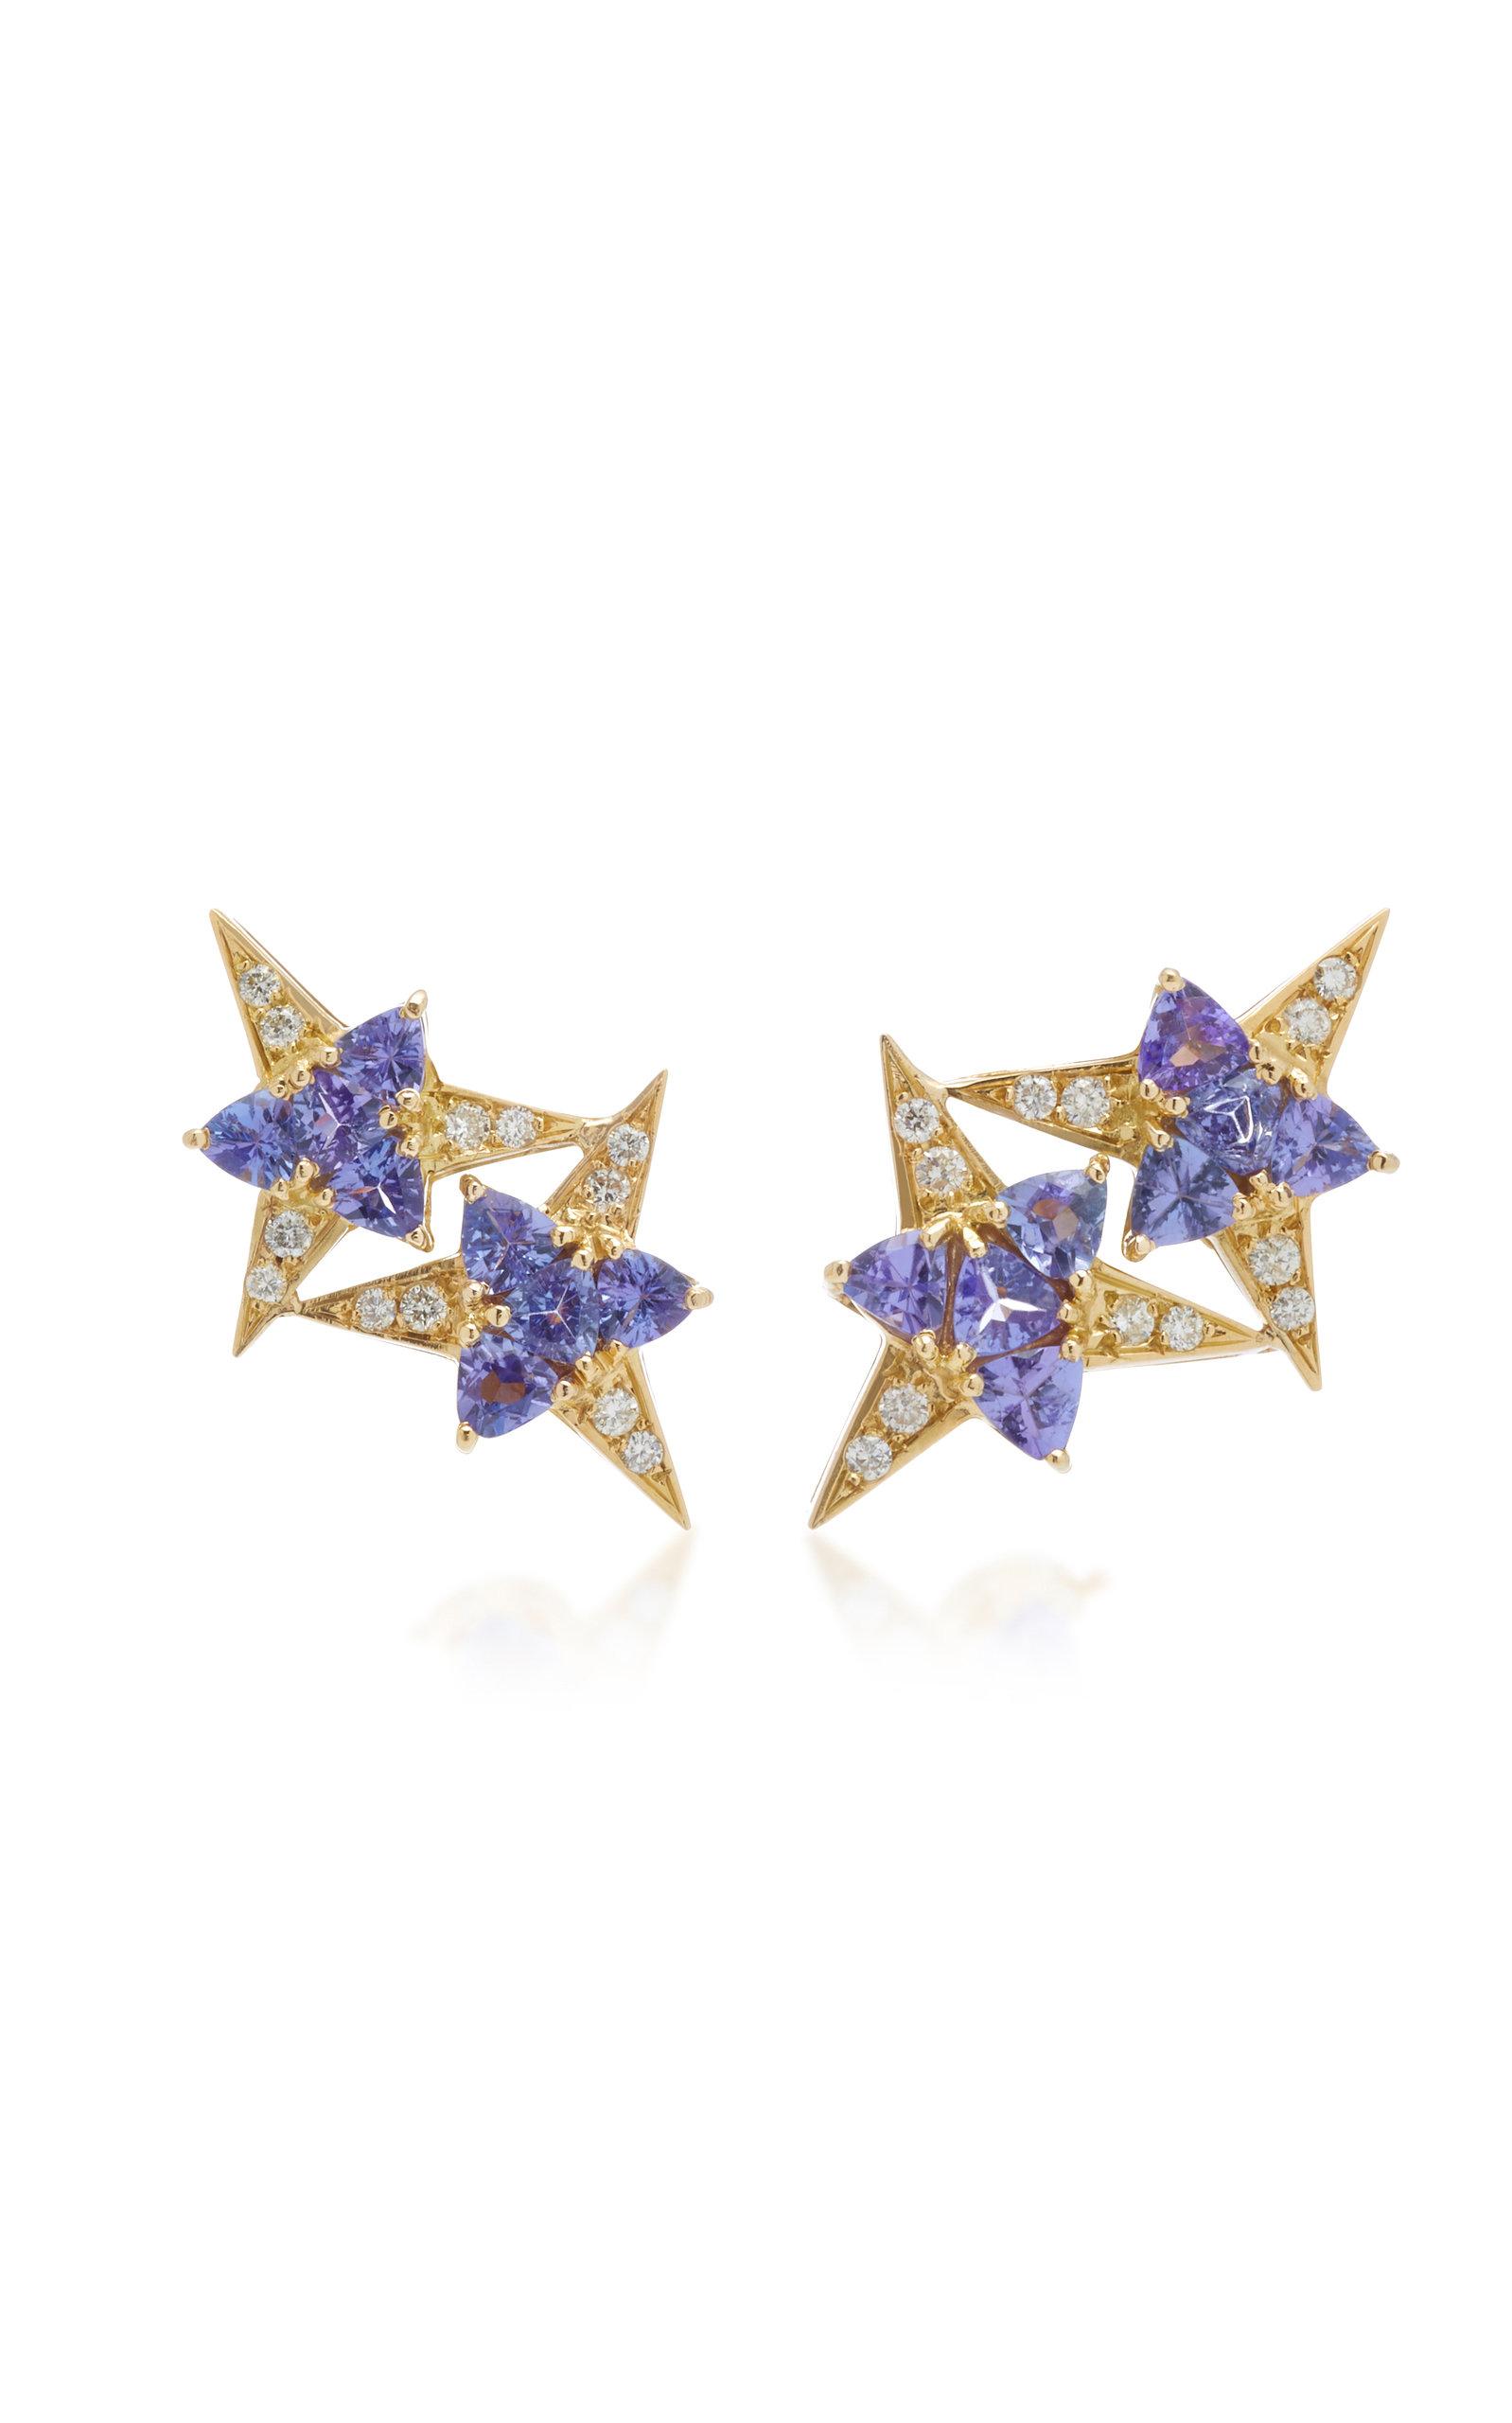 CAROL KAUFFMANN Galactic Star 18K Gold Tanzanite And Diamond Earrings in Blue